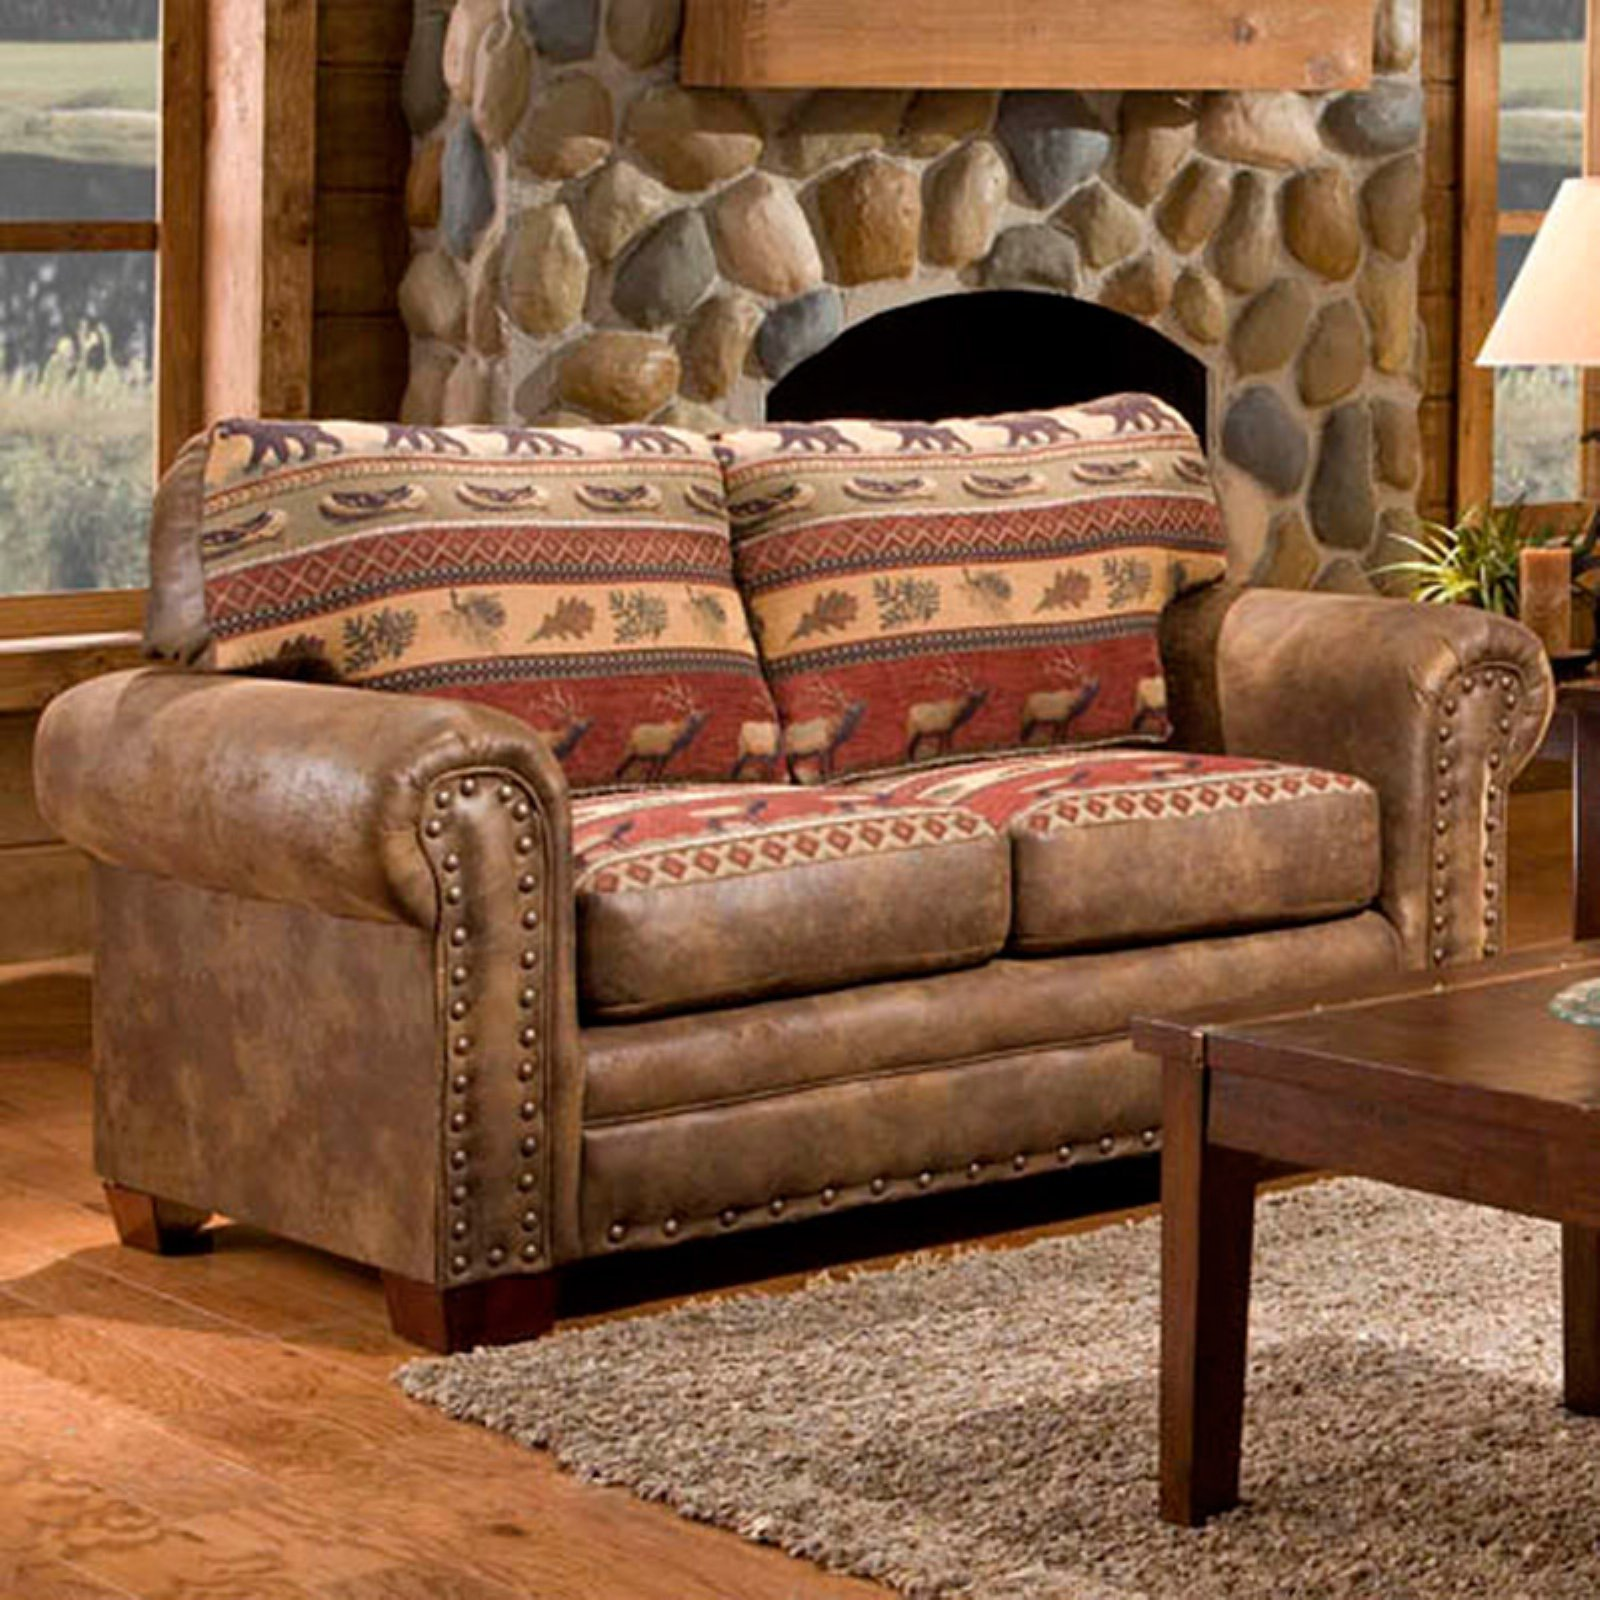 American Furniture Classics Sierra Lodge Loveseat